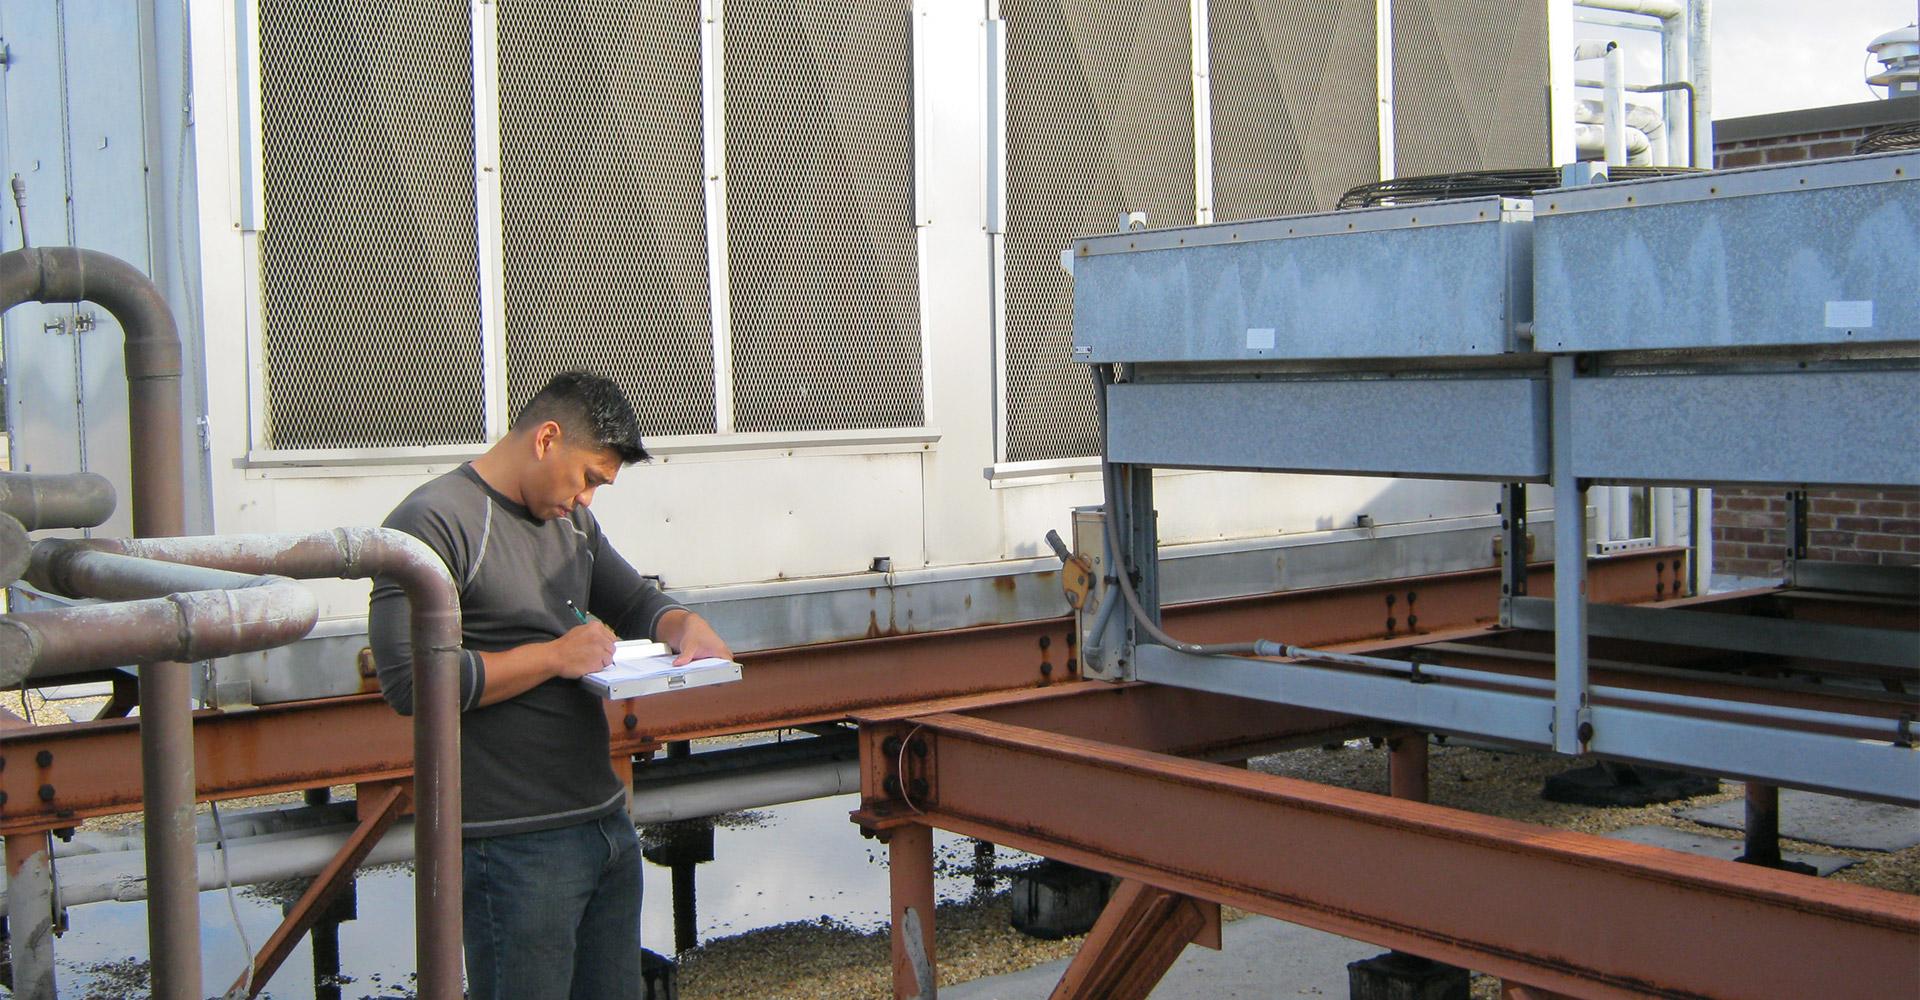 Man writing on clipboard.